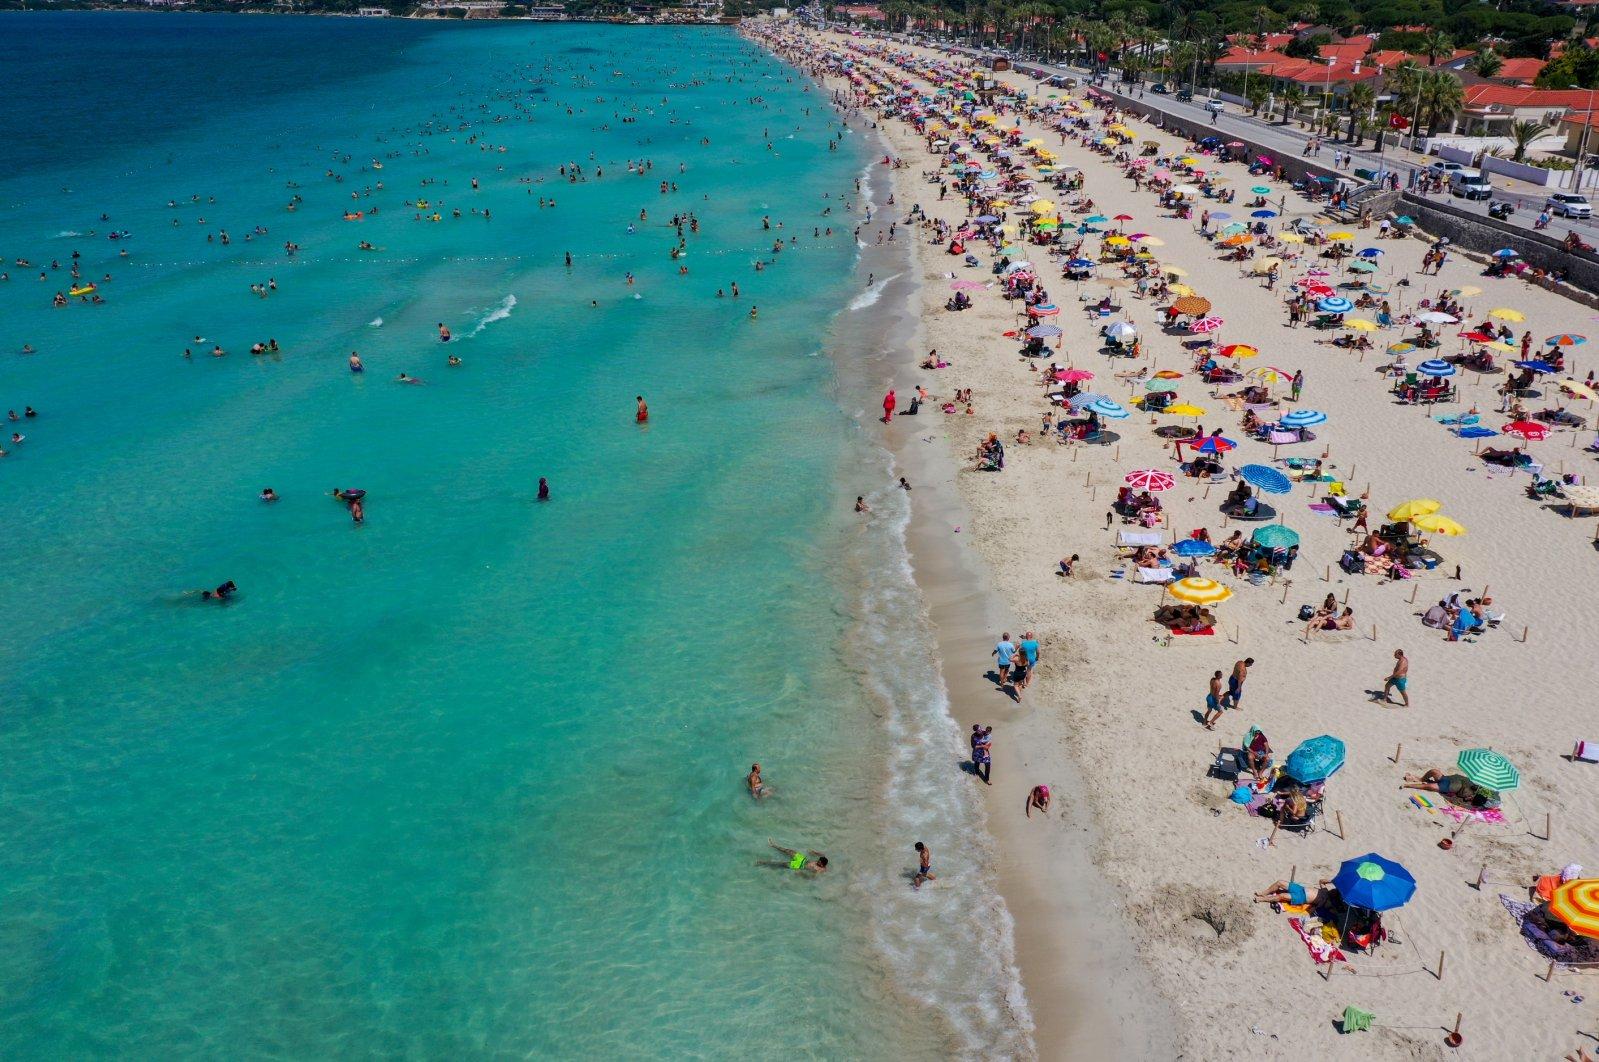 People are seen at Ilıca Beach in Çeşme, a resort town west of Izmir, in Turkey's Aegean region, July 19, 2020. (AA Photo)